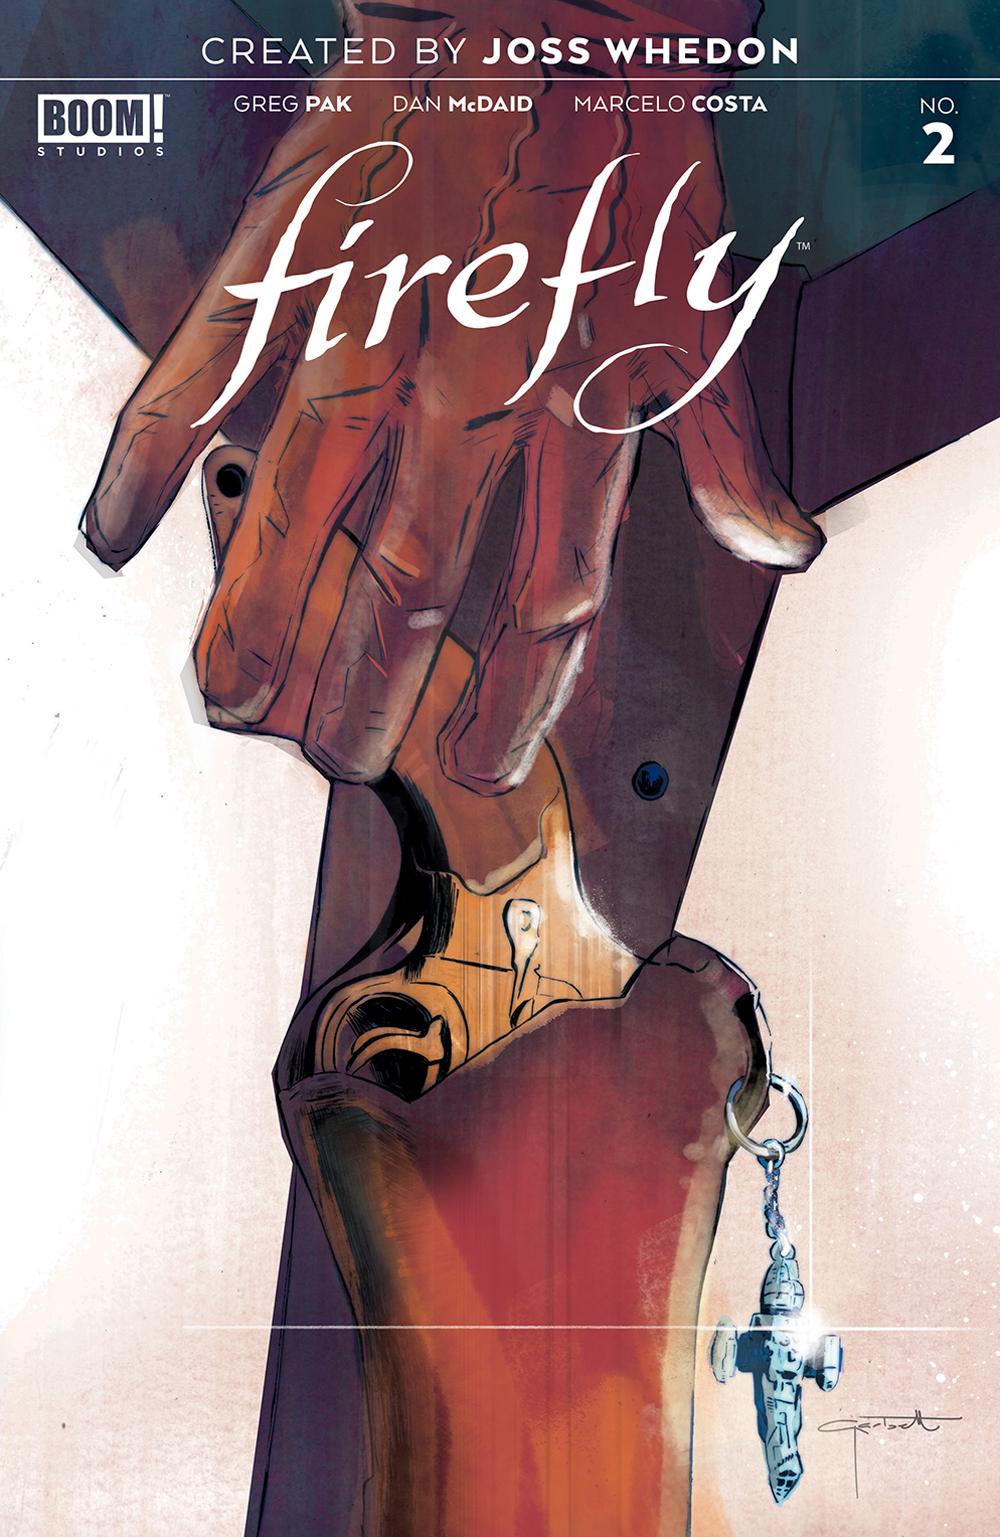 FIREFLY #2 MAIN